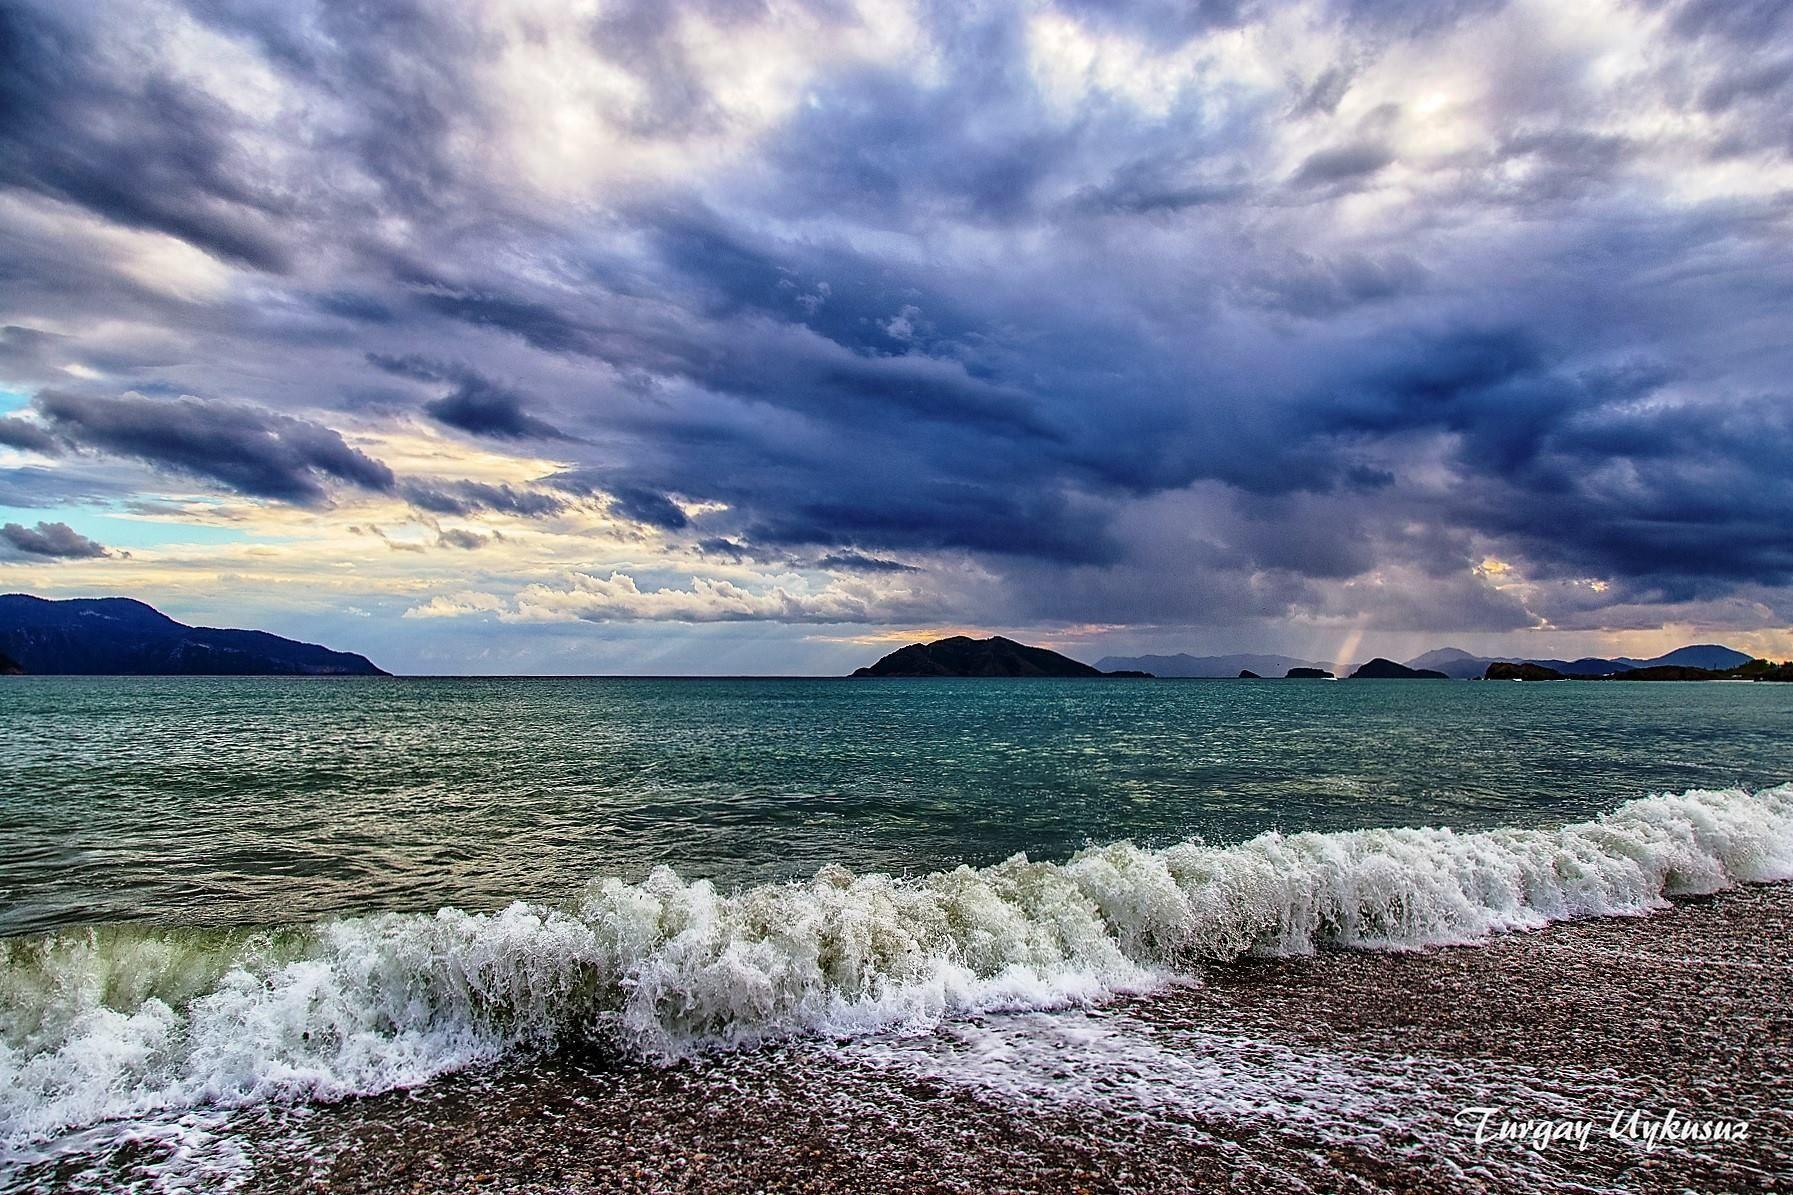 October evening in #Calis Beach, #Fethiye, #Turkey